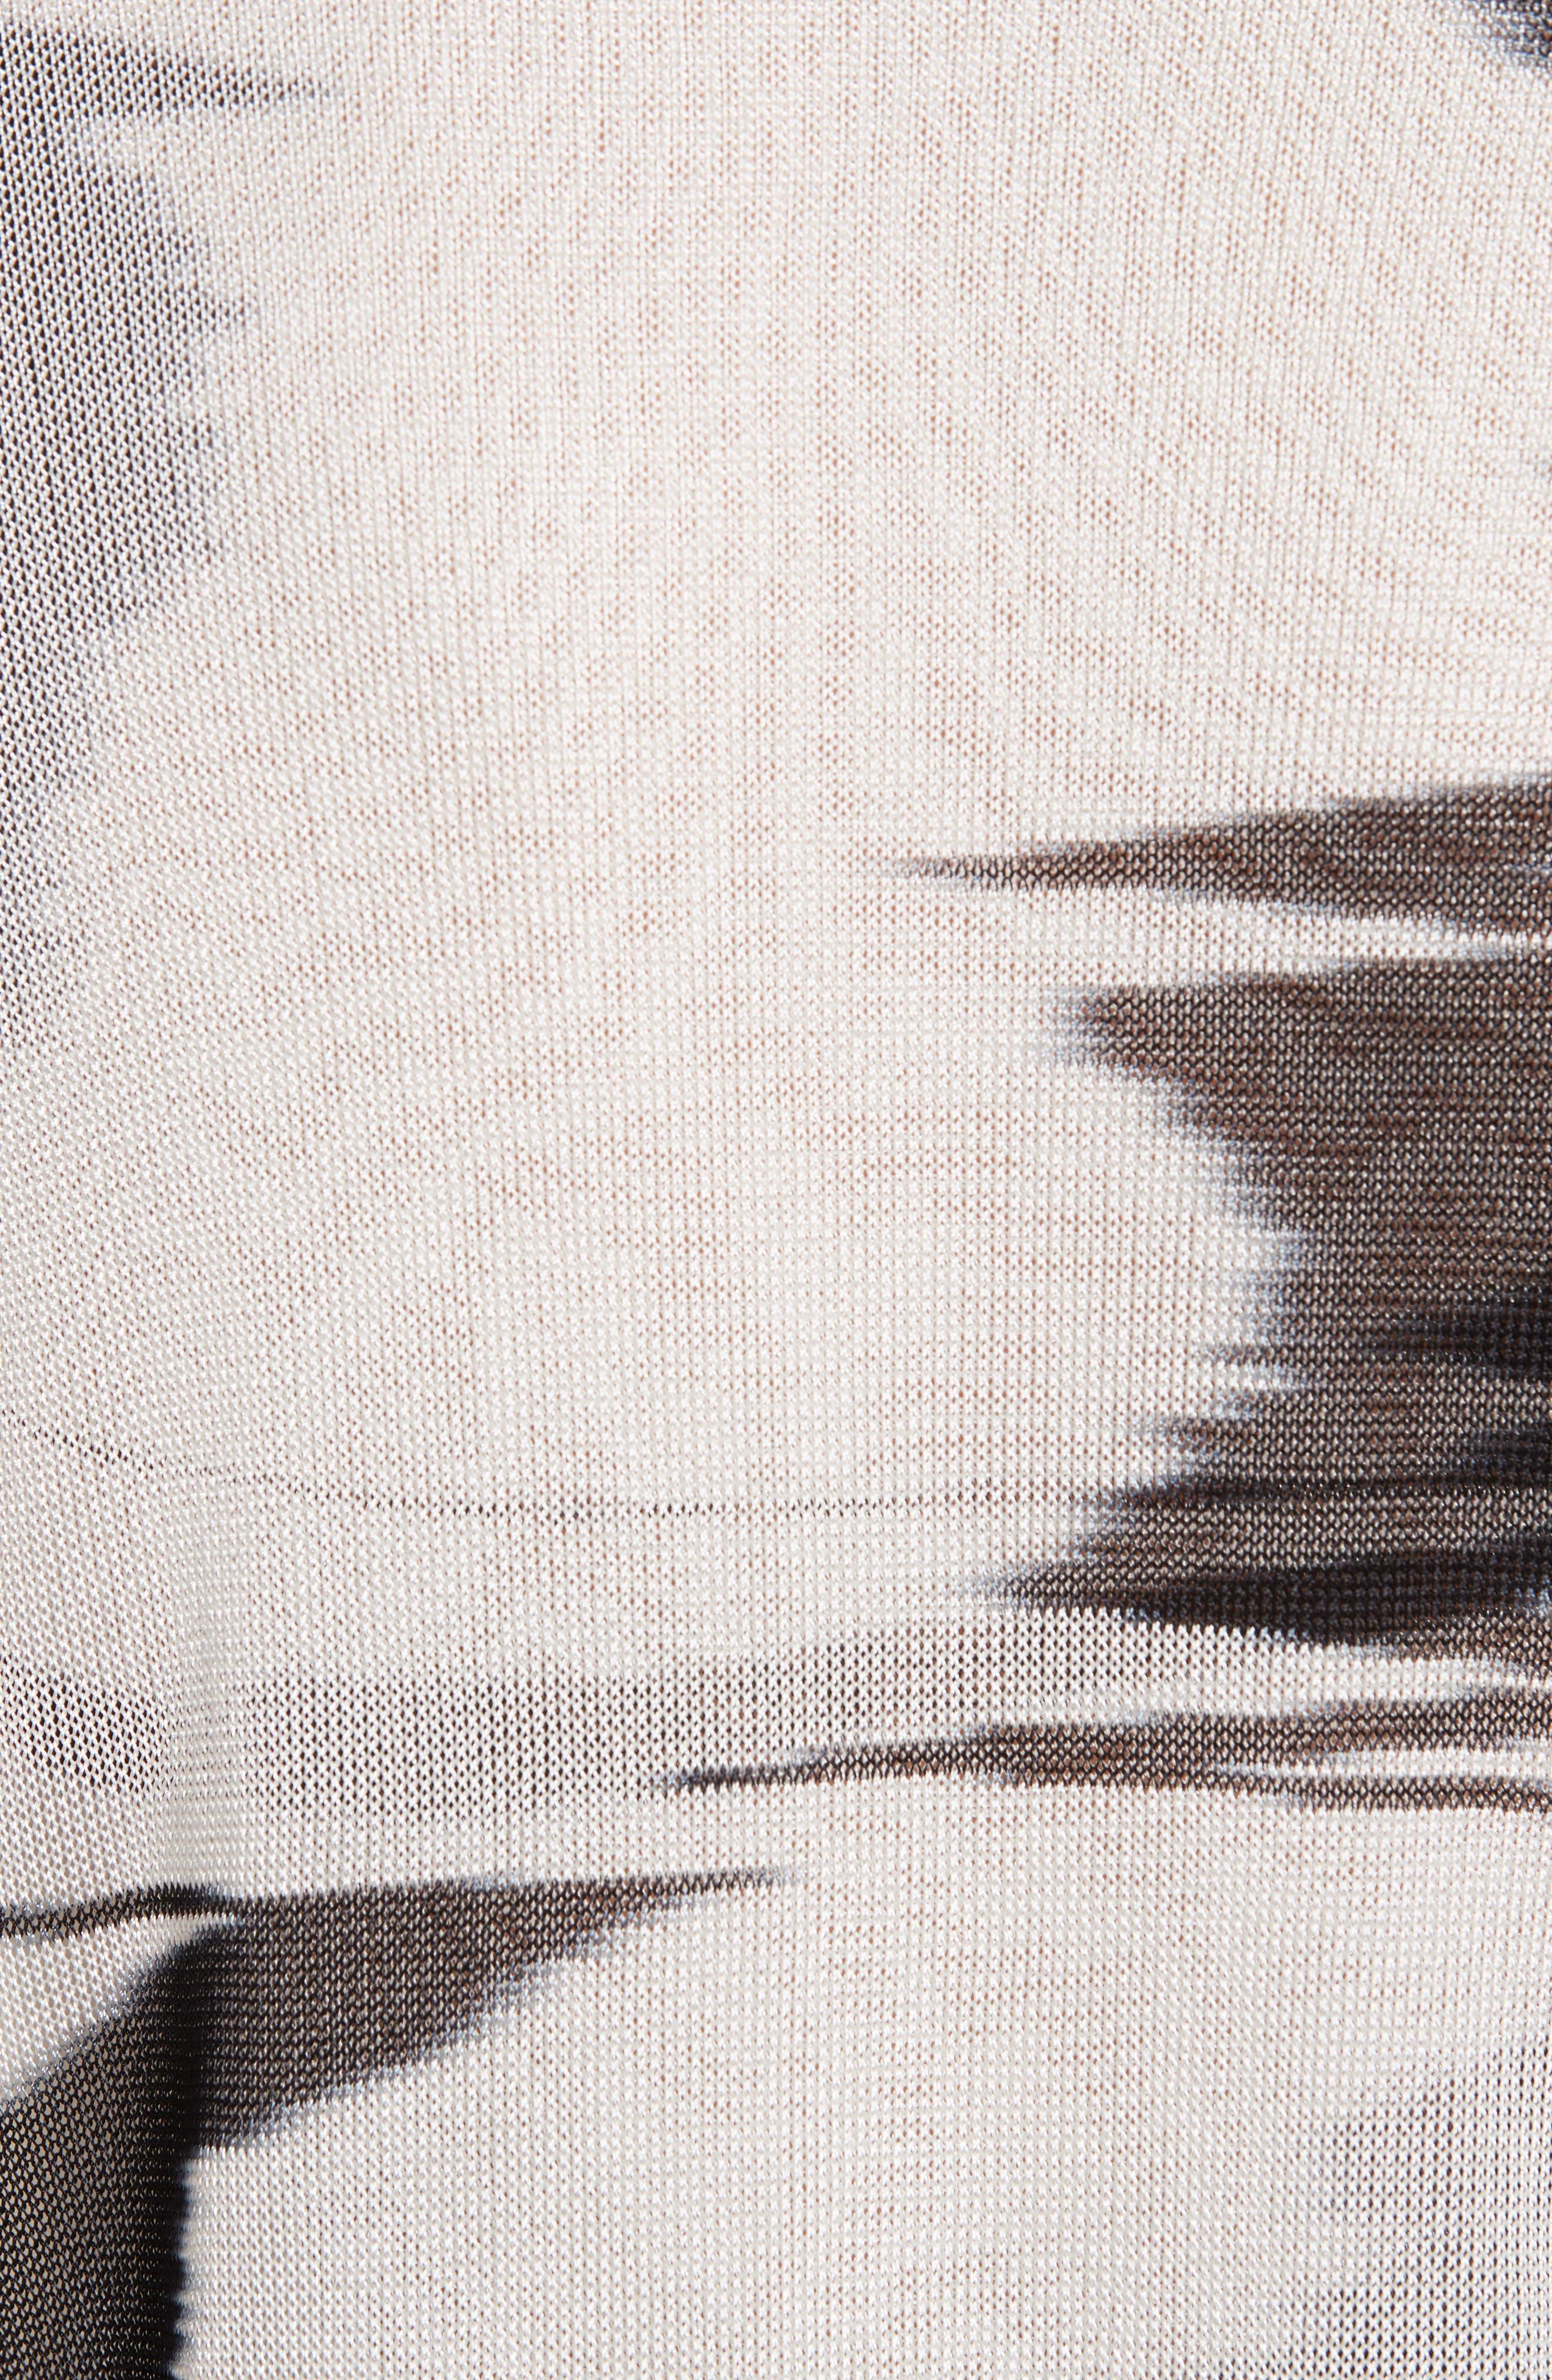 Space Dye Cardigan,                             Alternate thumbnail 5, color,                             F0009 BLACK/ WHITE